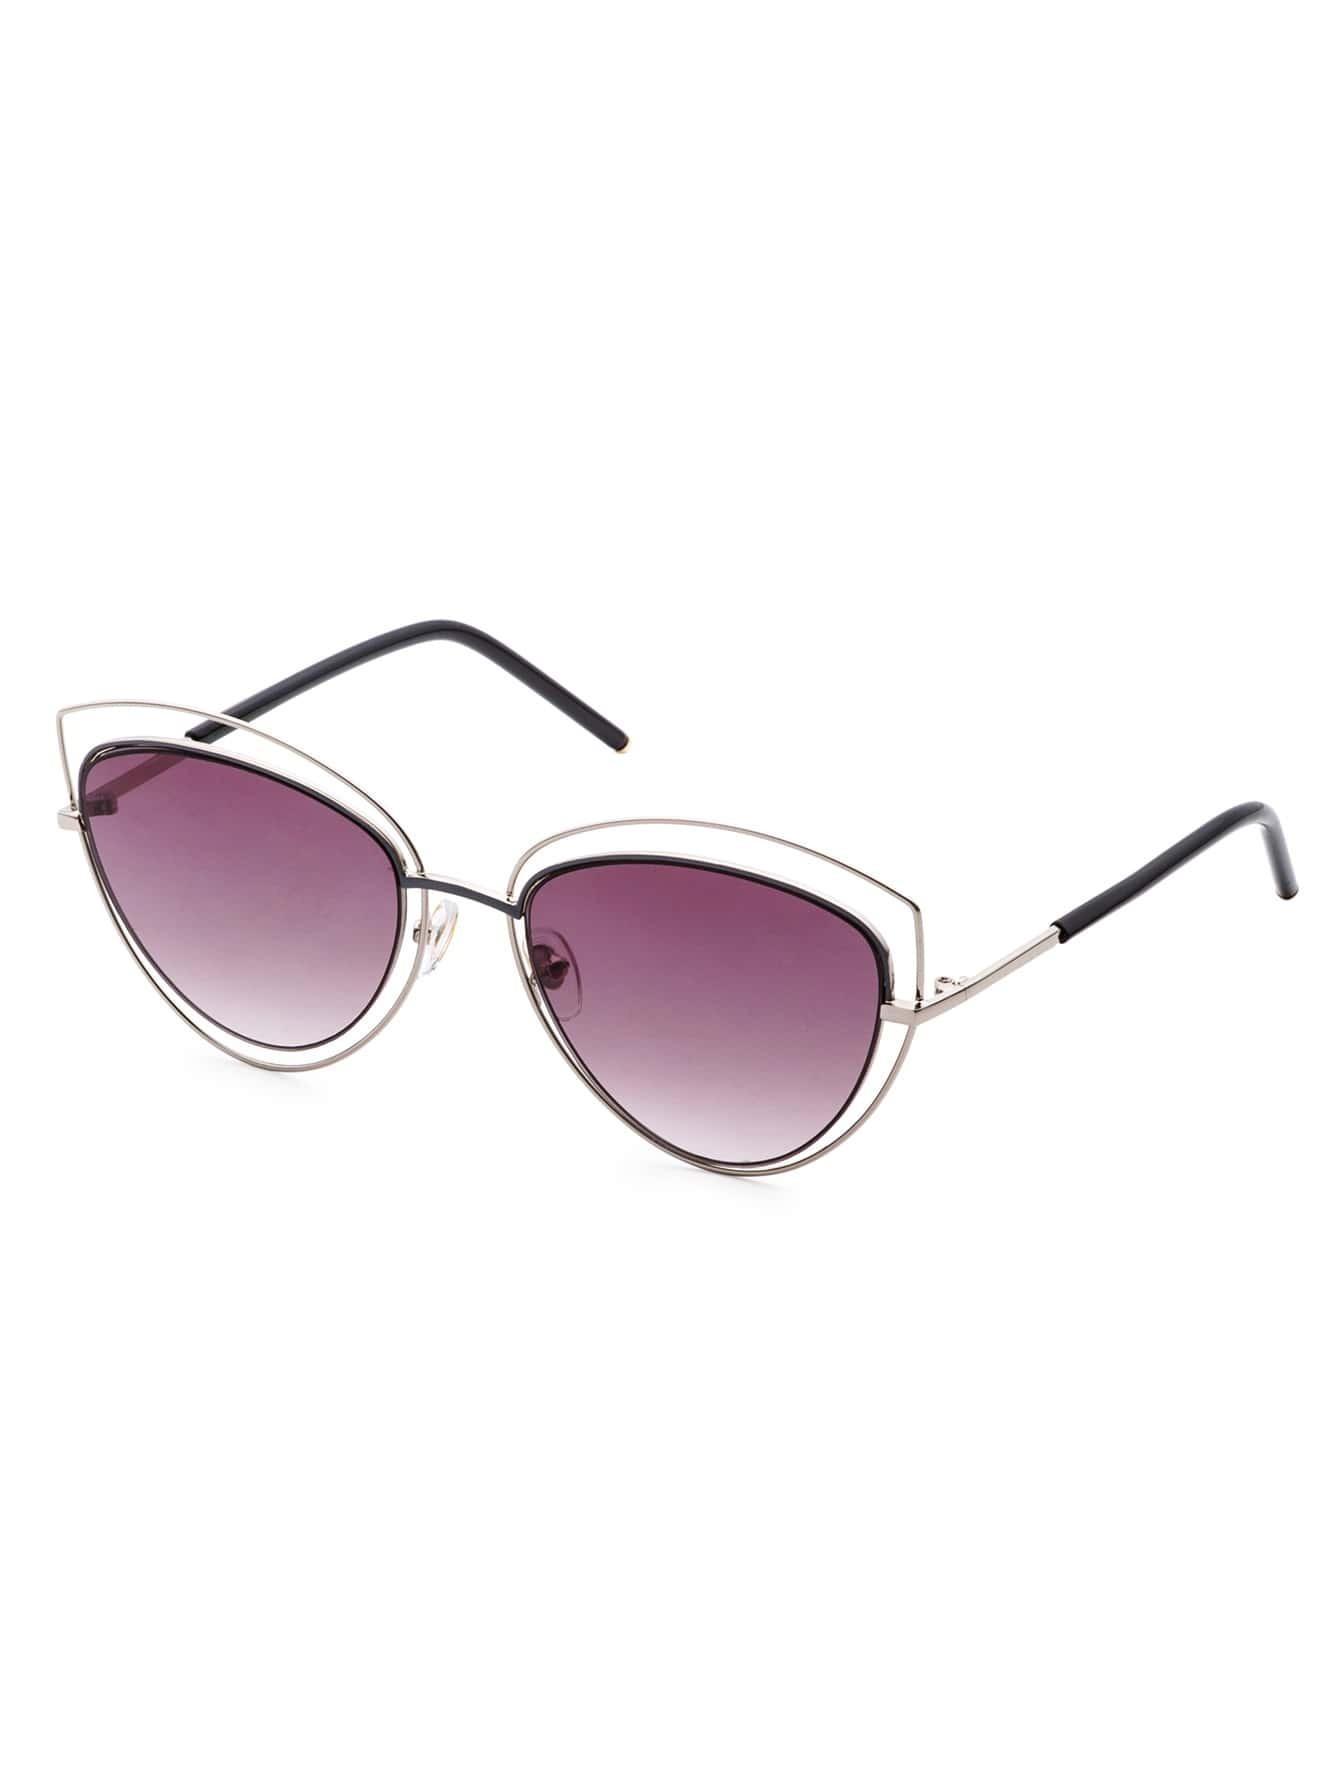 Silver Frame Purple Lens Cat Eye Sunglasses